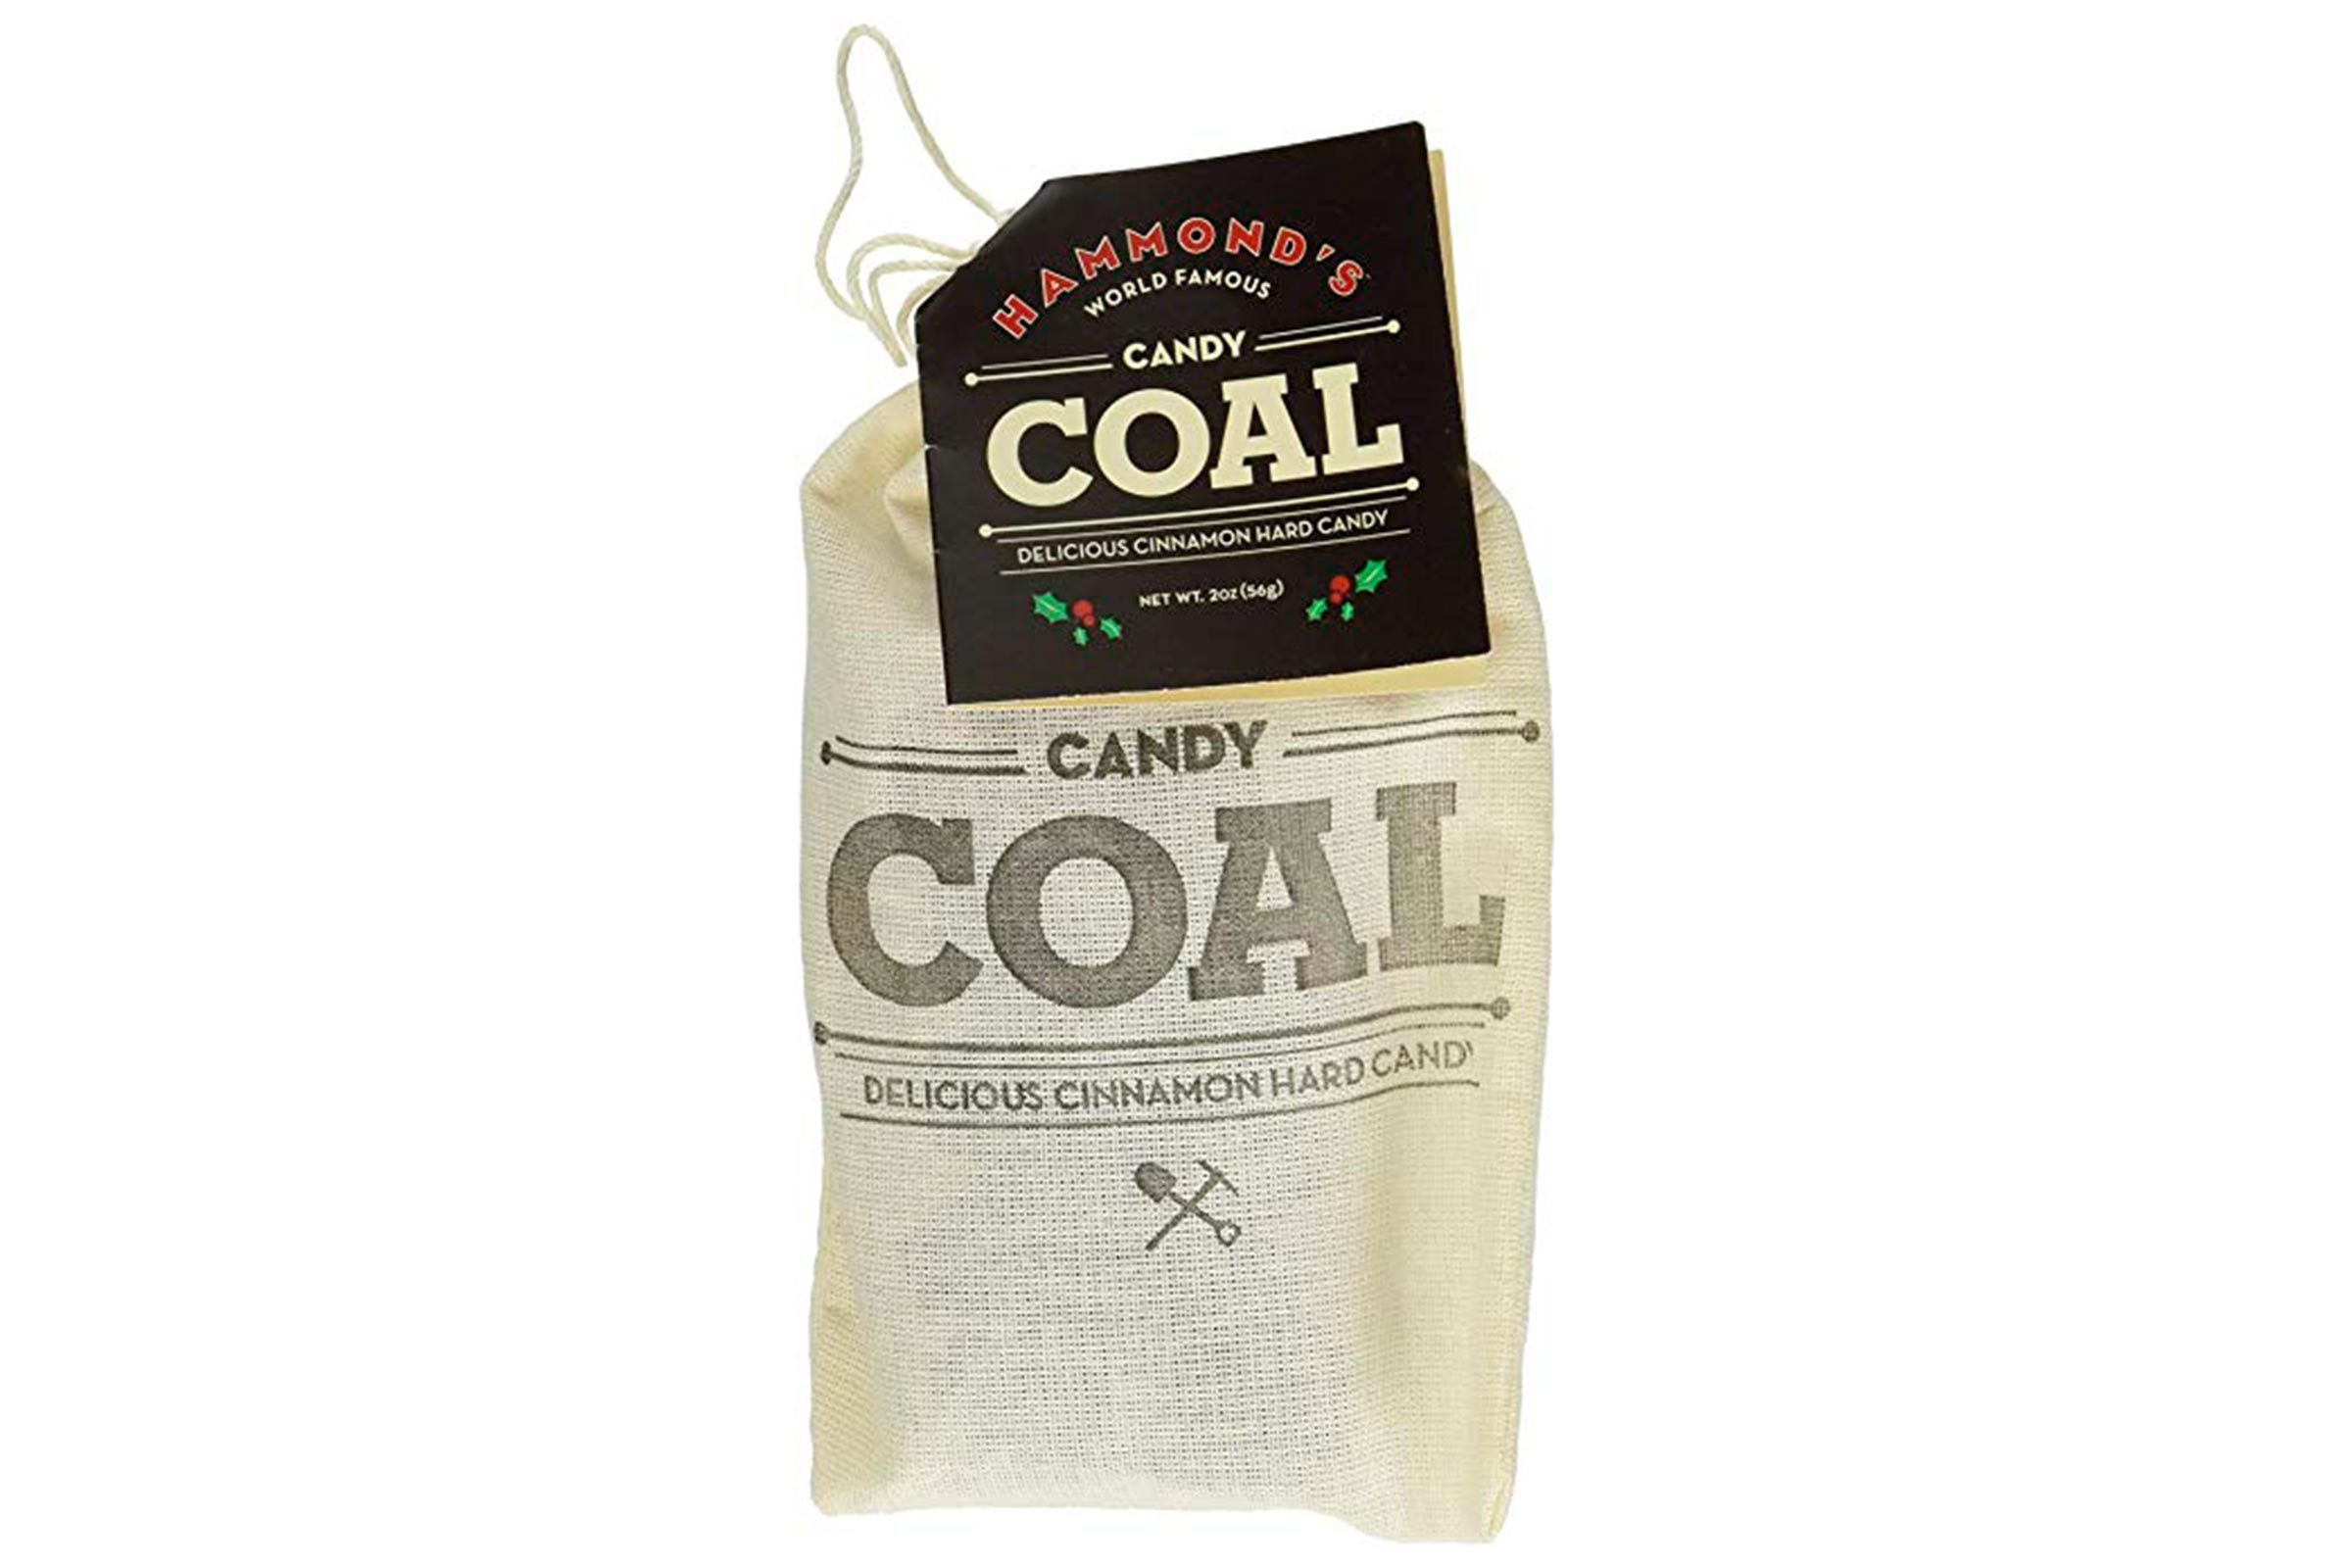 Candy Coal